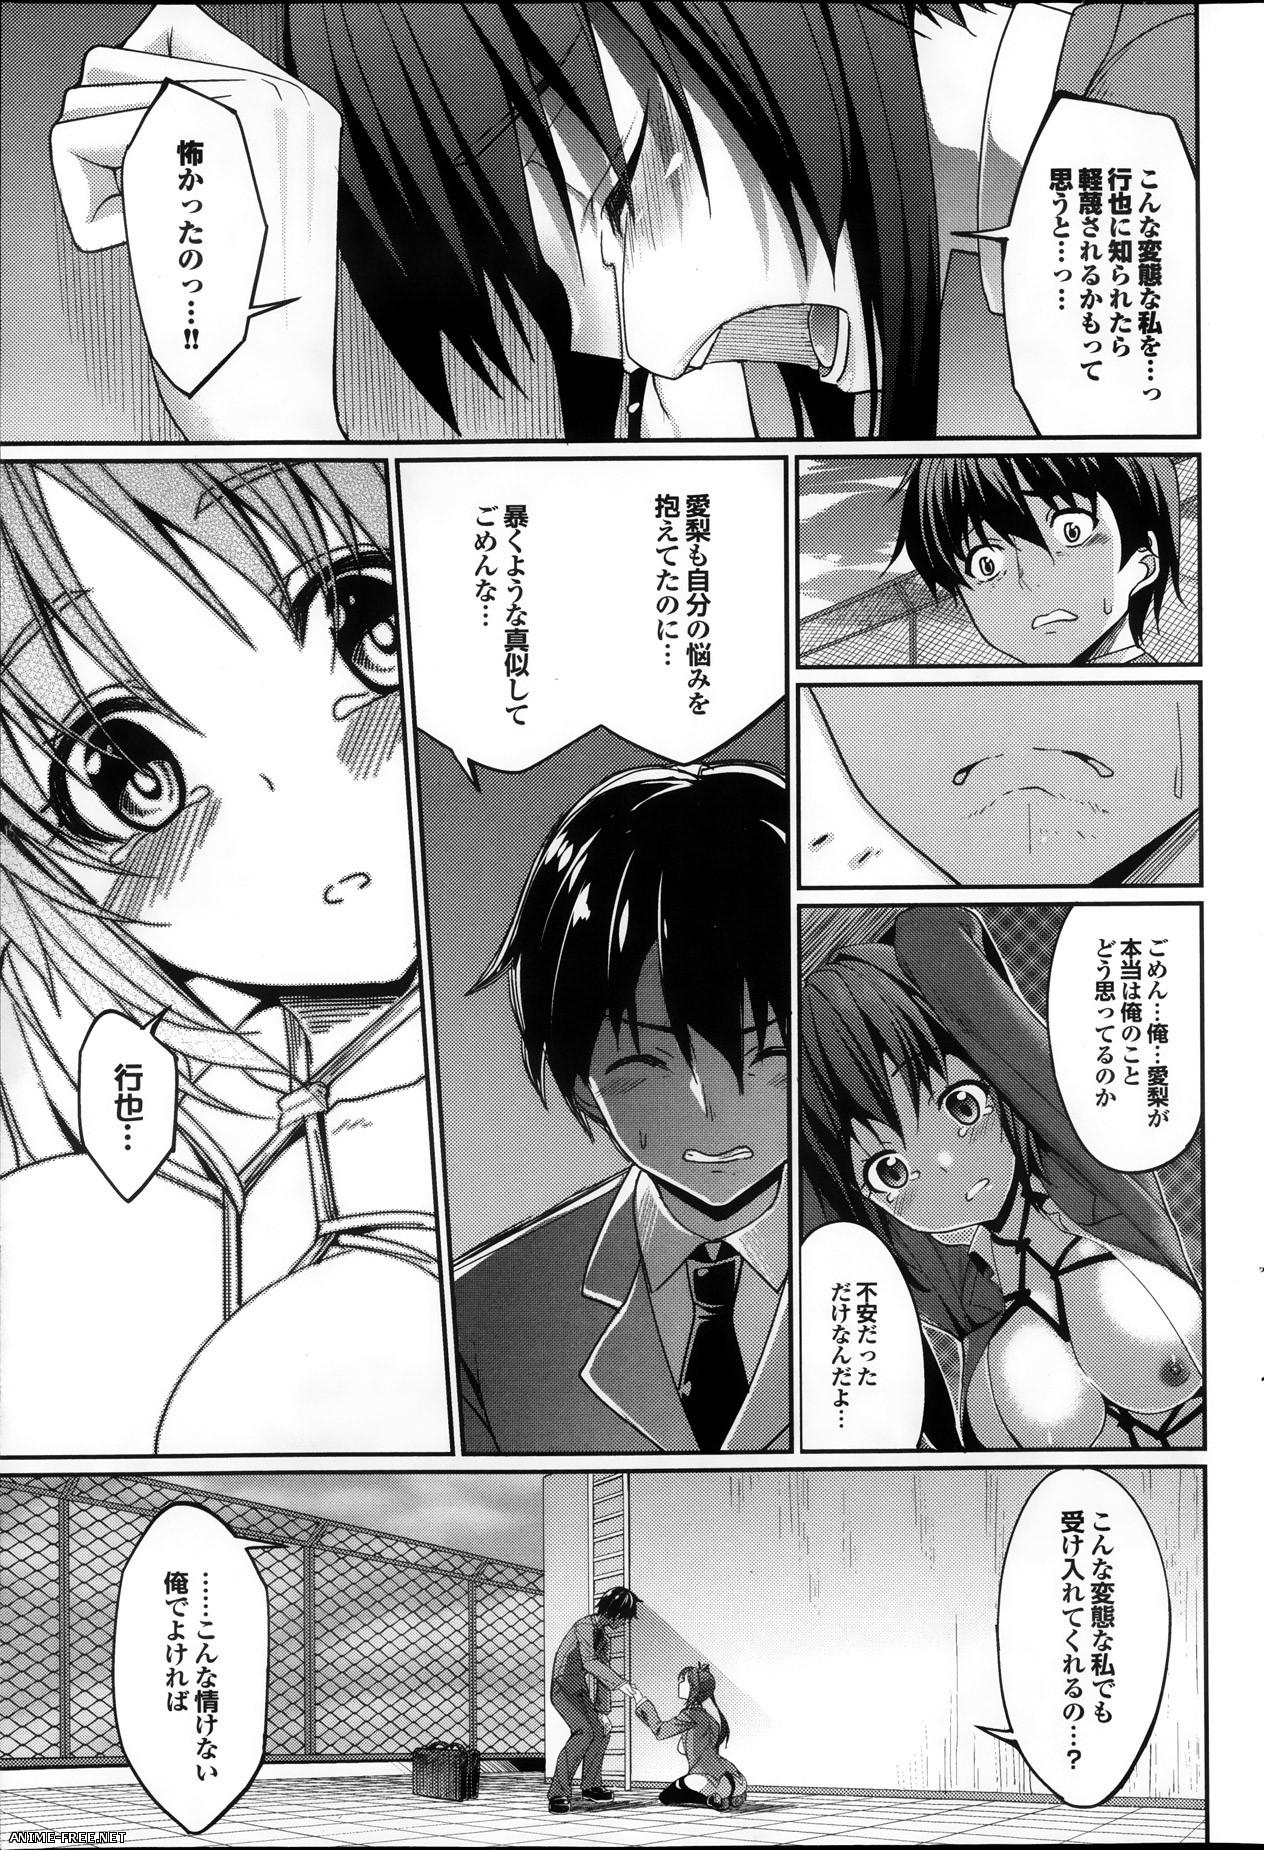 Журнал COMIC PURUMELO [2007-2014] [Cen] [JAP] Manga Hentai